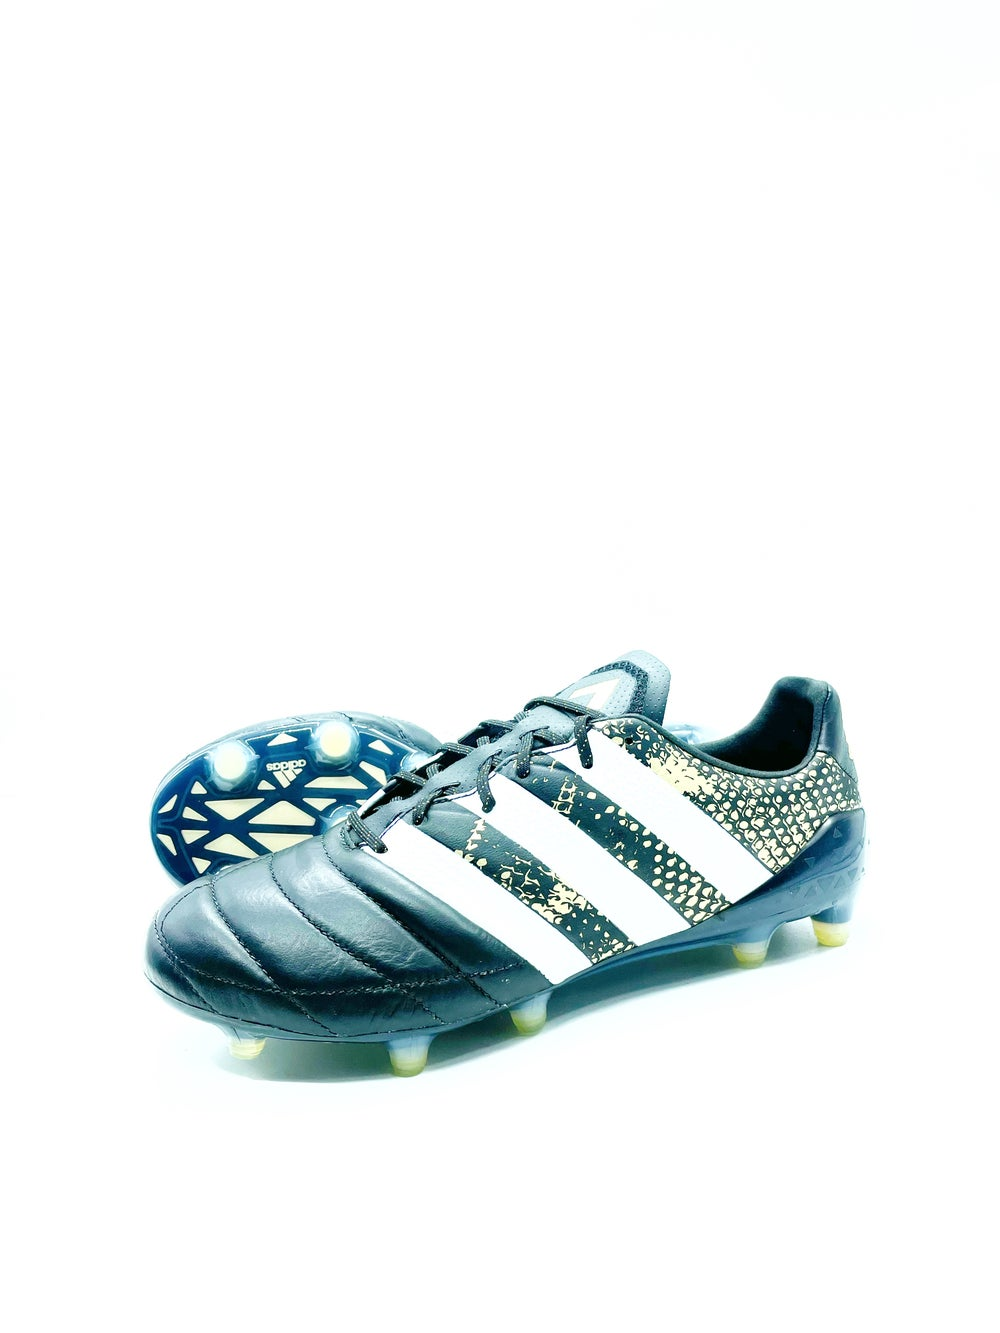 Image of Adidas 16.1 ACE black gold FG or SG